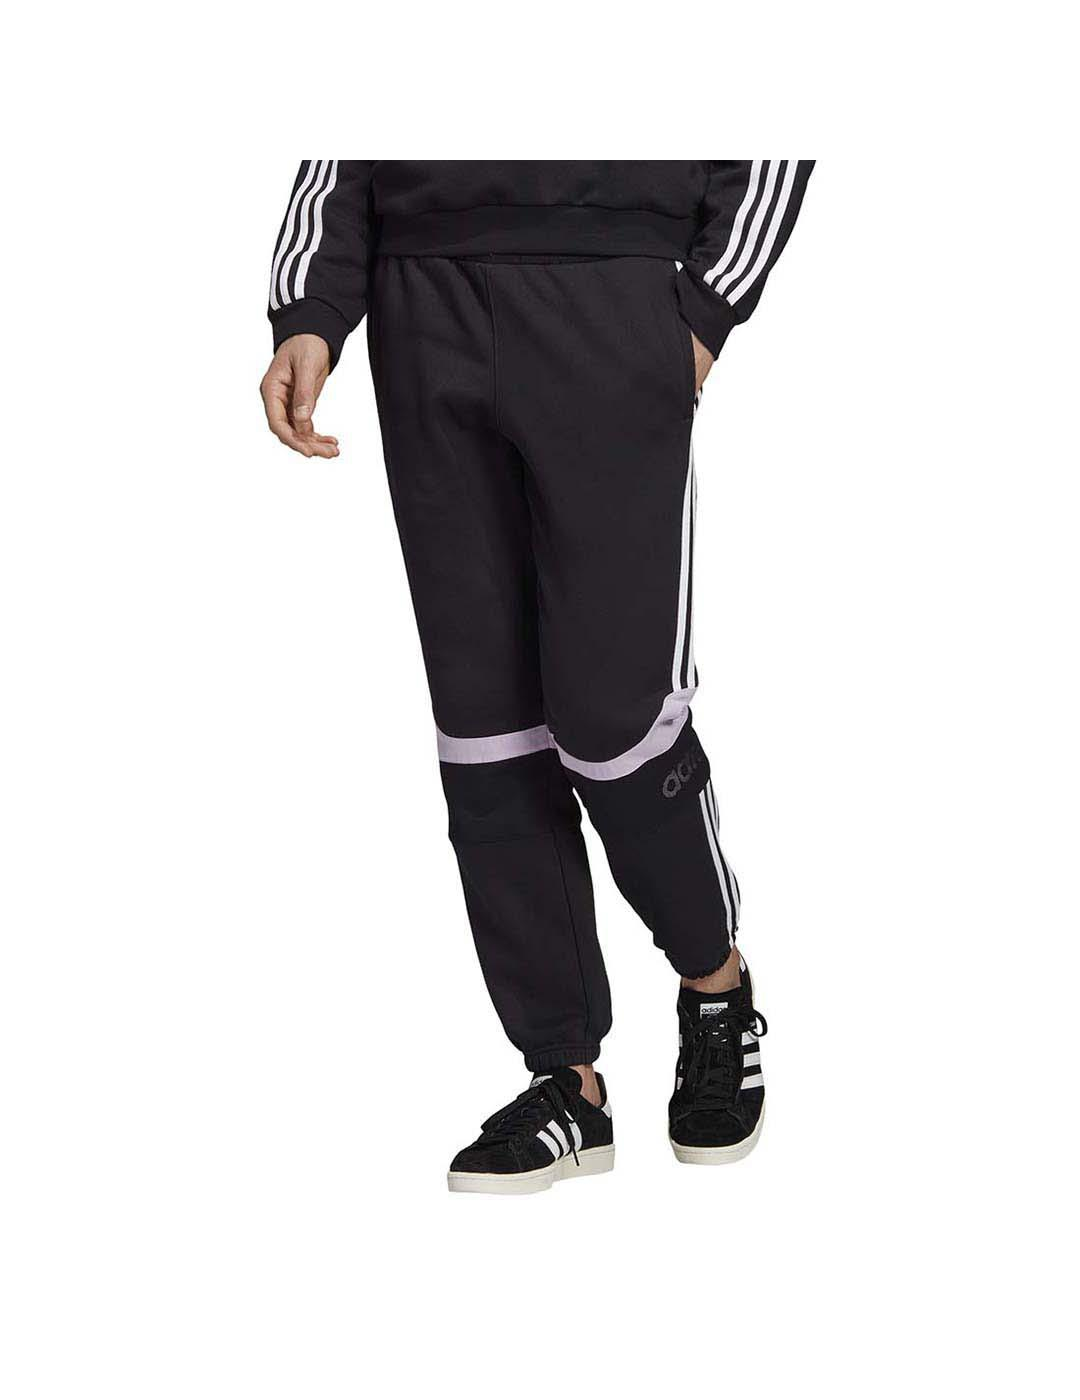 Pantalón Adidas Ts Trf Sp NegroLilcla Hombre S